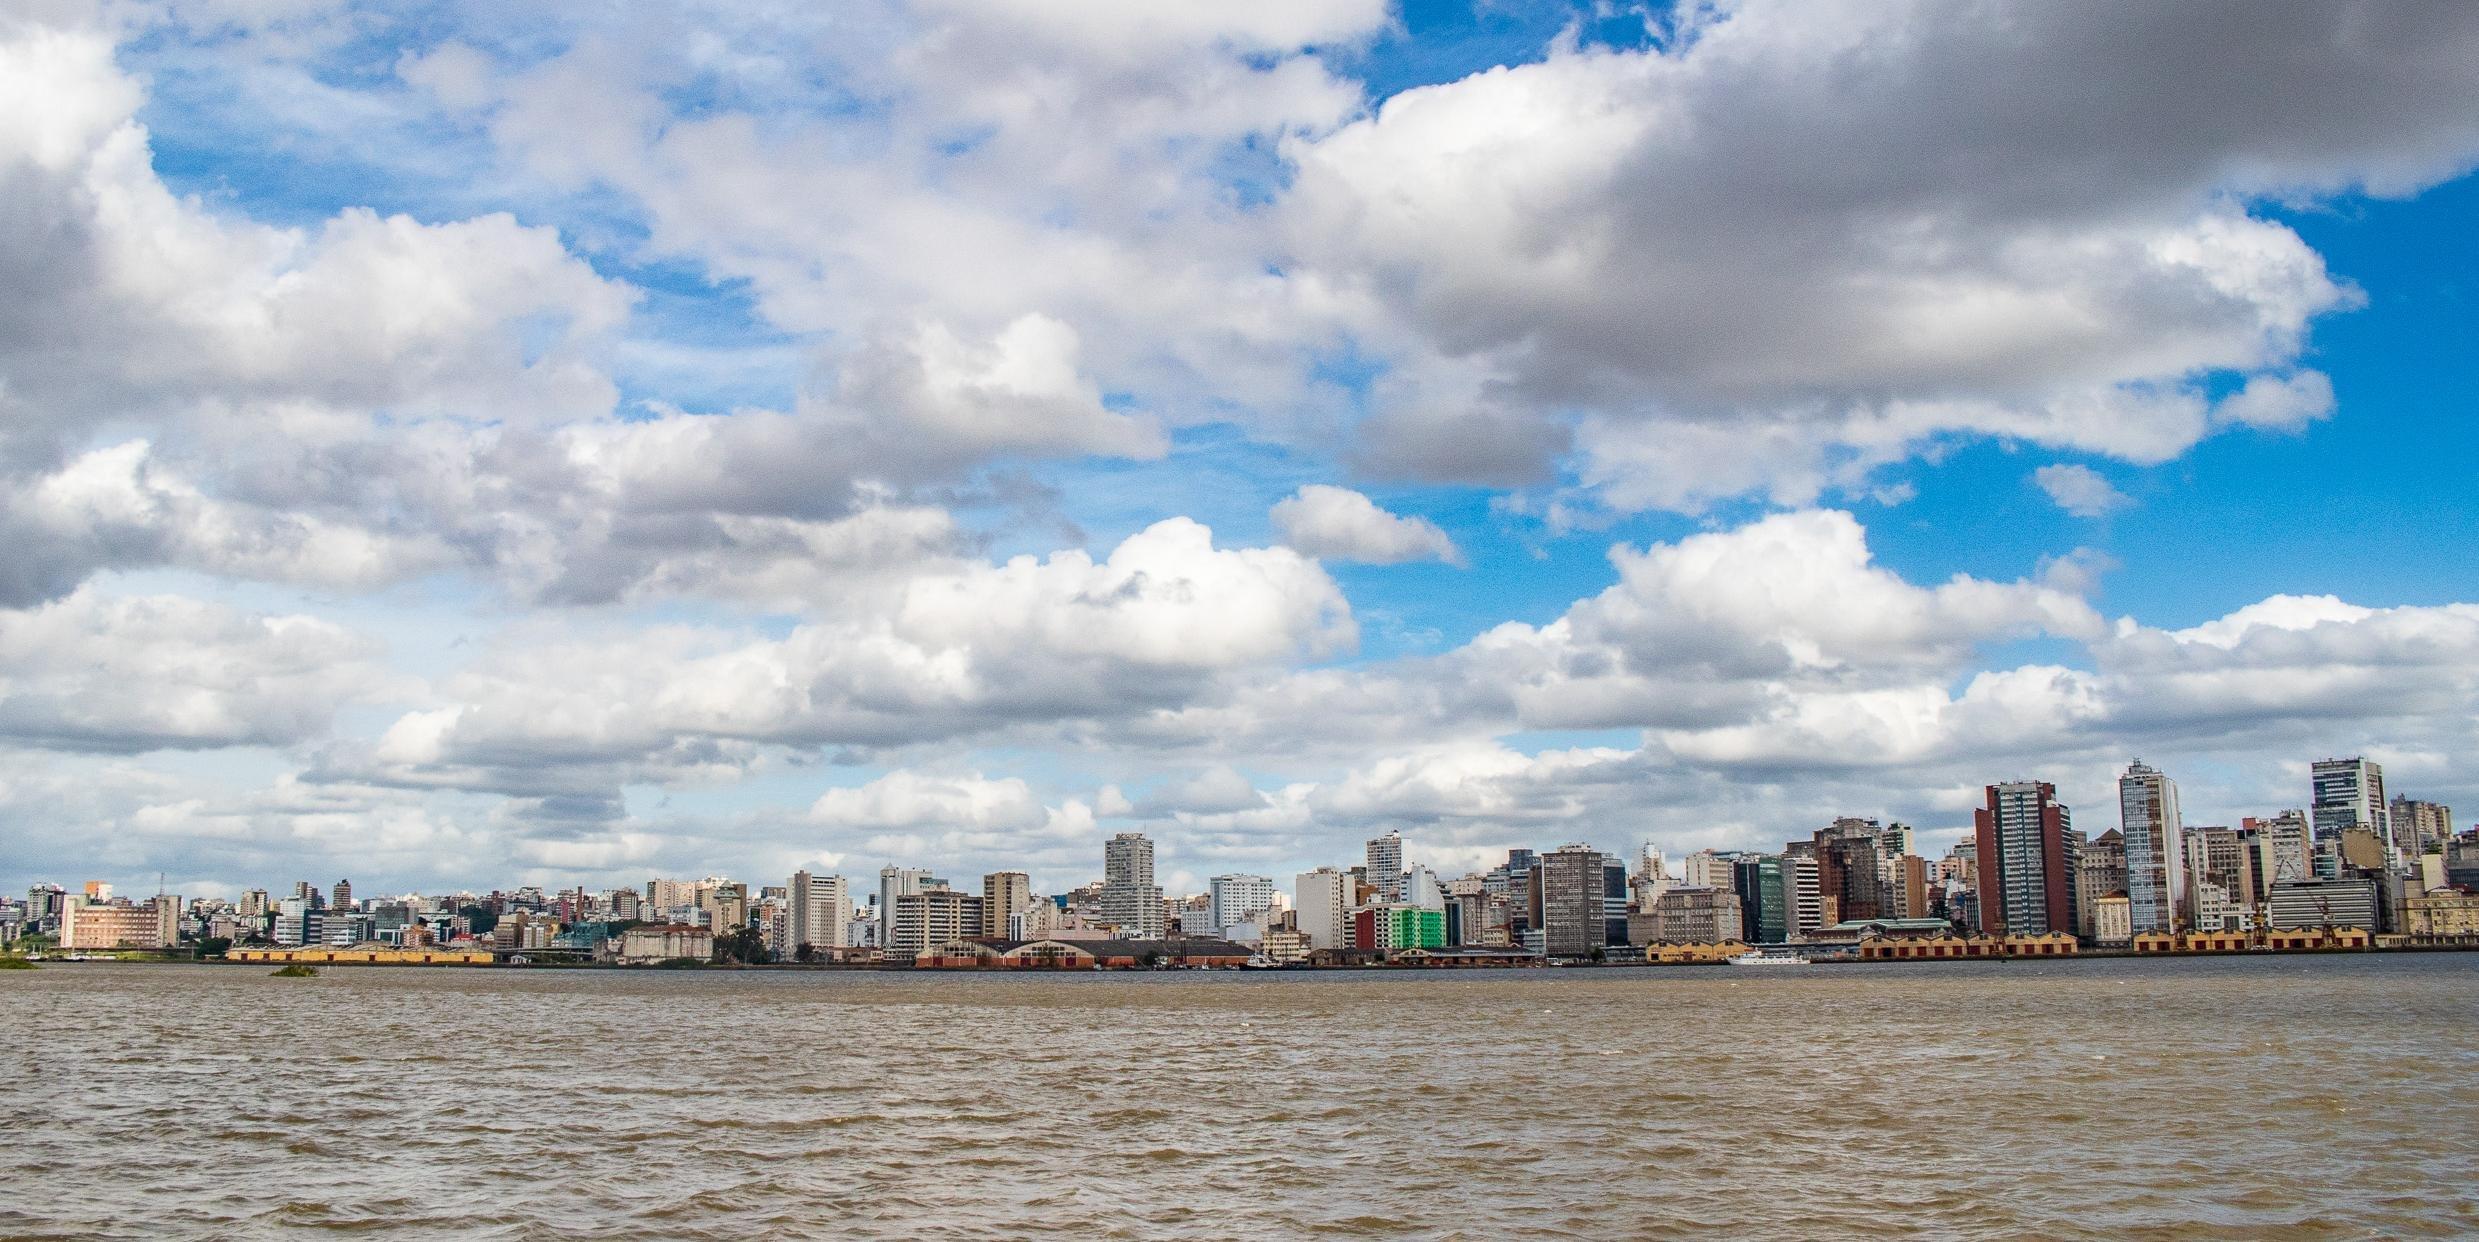 Porto Alegre terá máxima de 26°C nesta terça